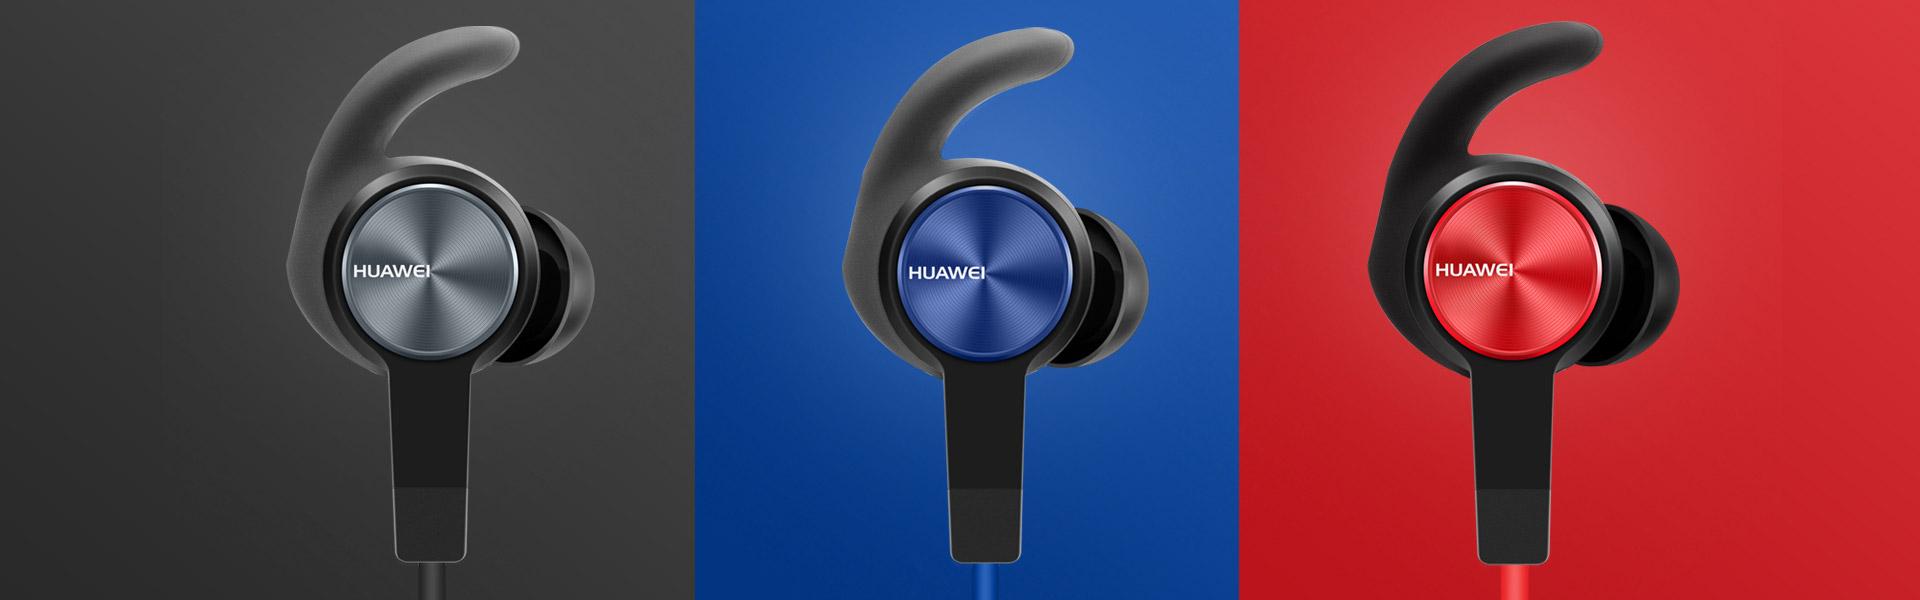 Huawei Sport Headphones Lite Accessories Huawei Saudi Arabia